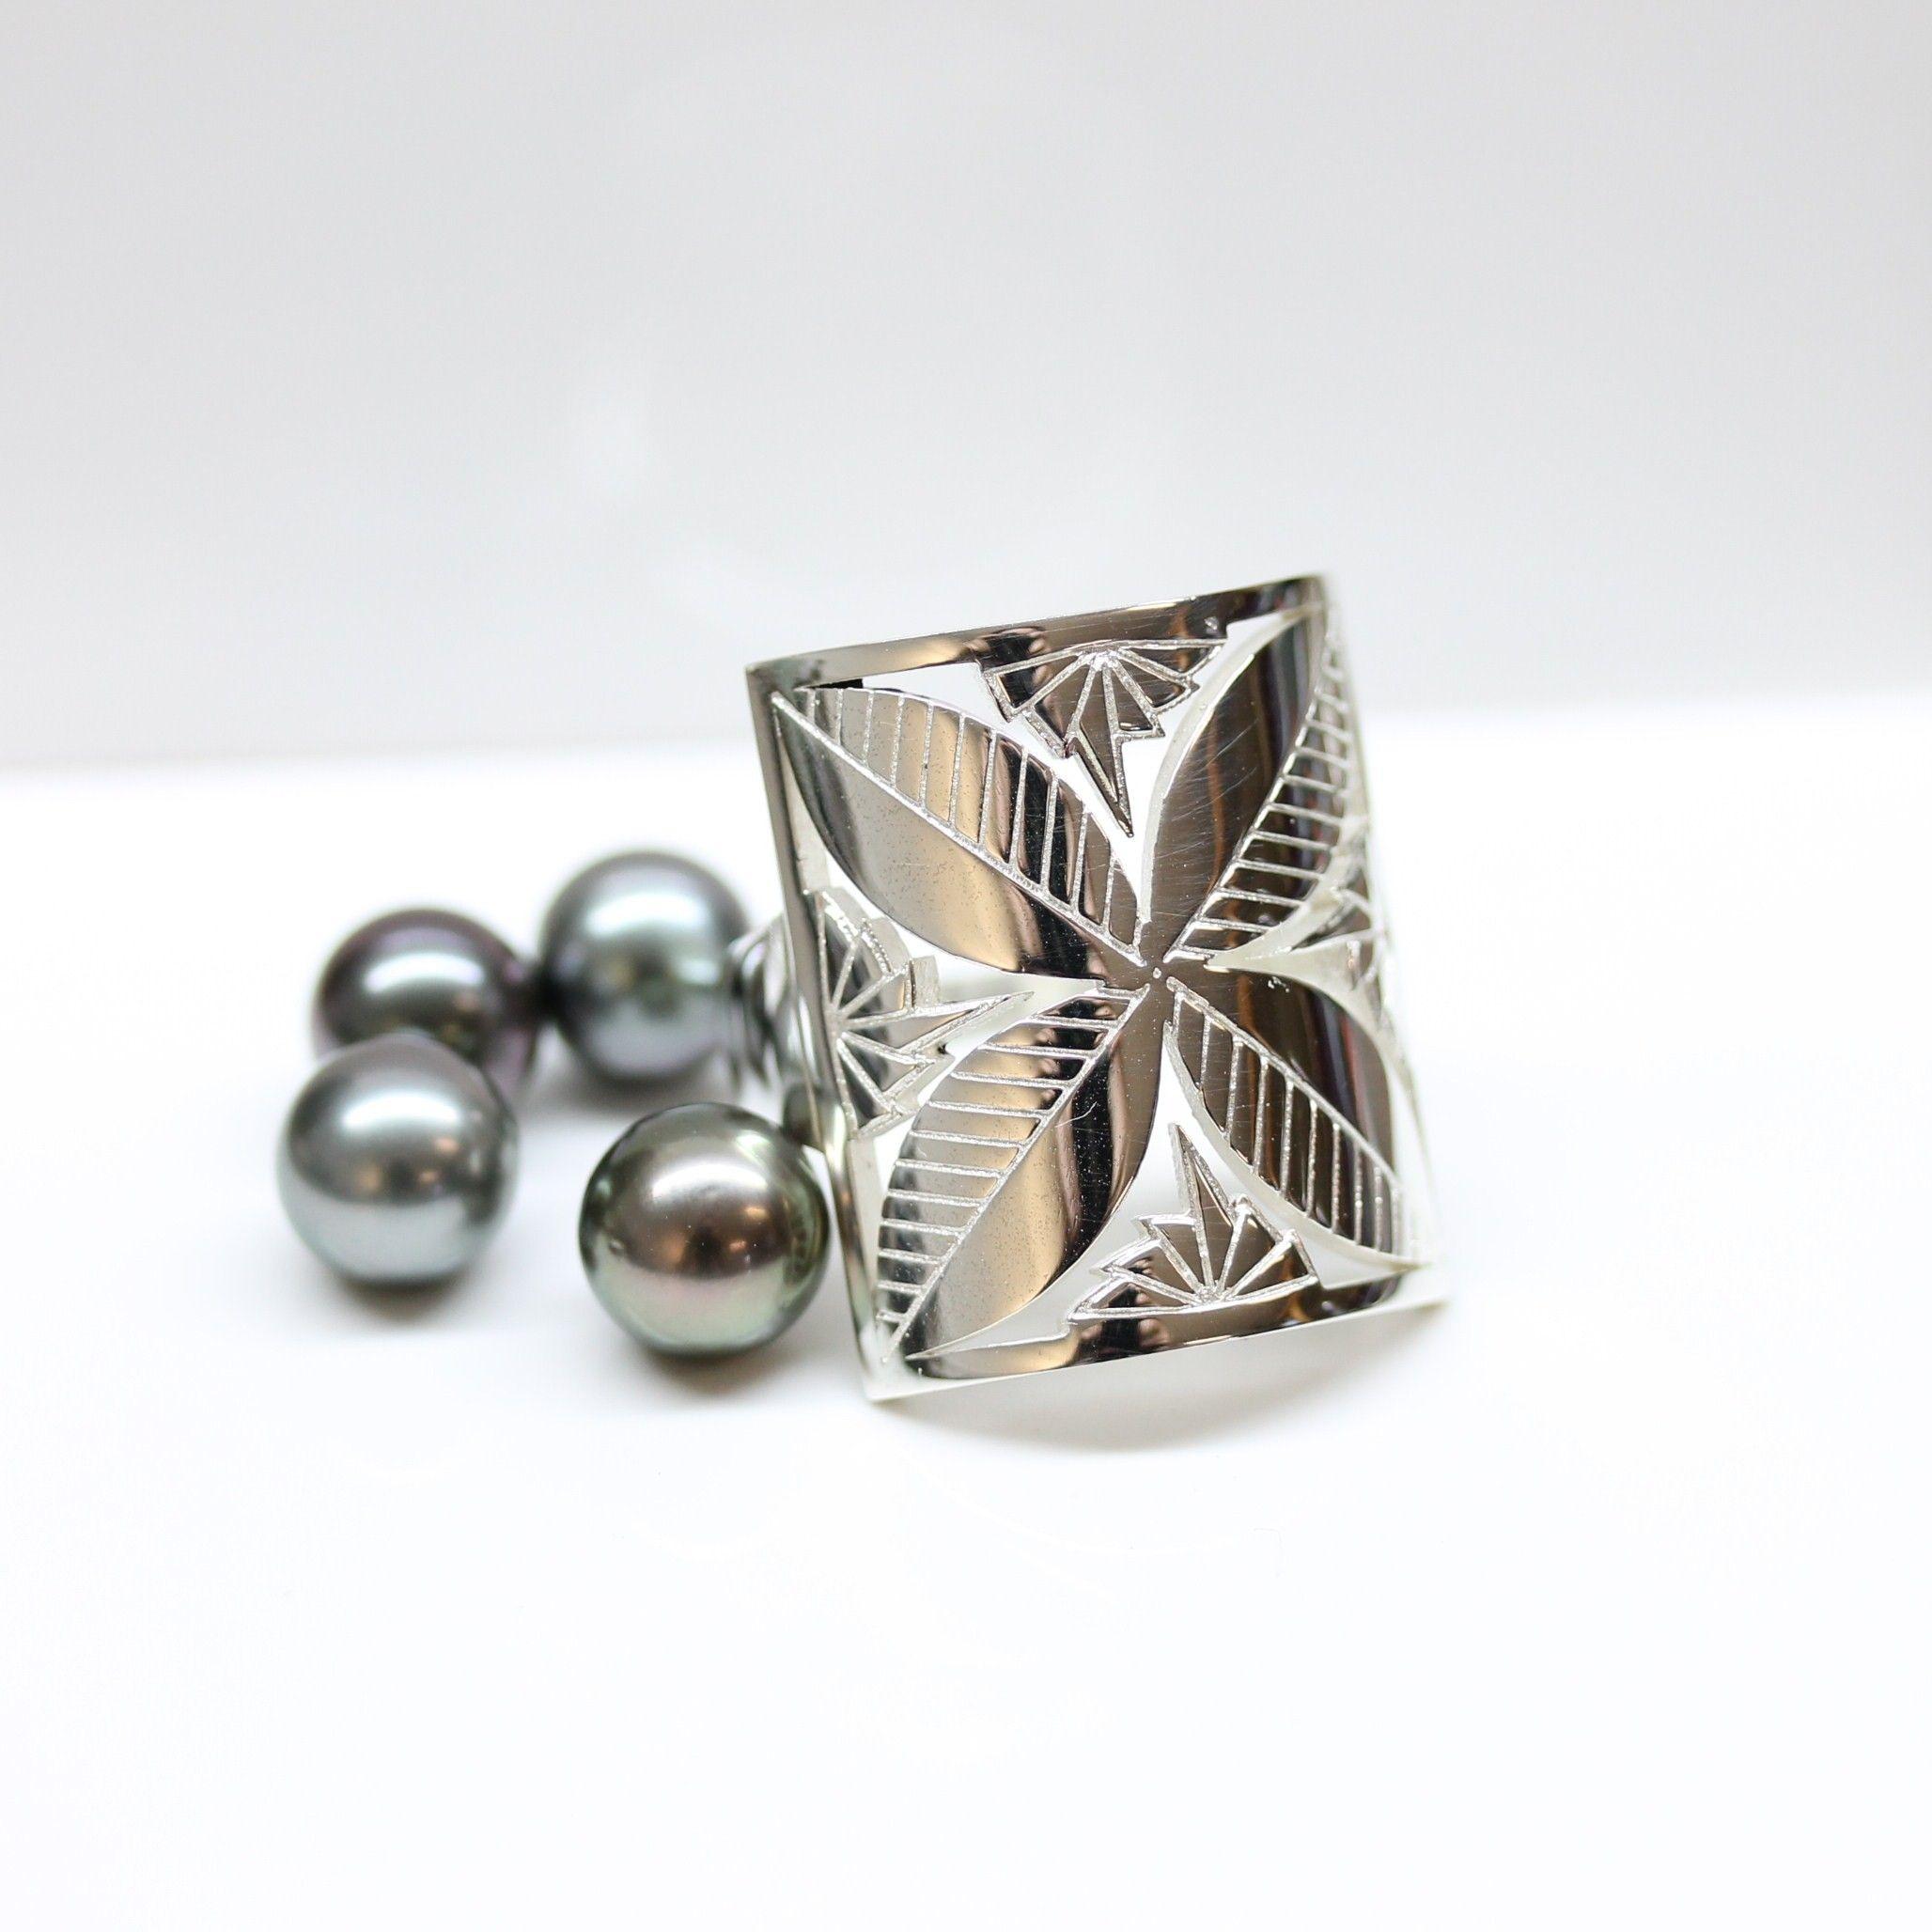 Detailed Flower Ring Nesian Creations Island jewelry